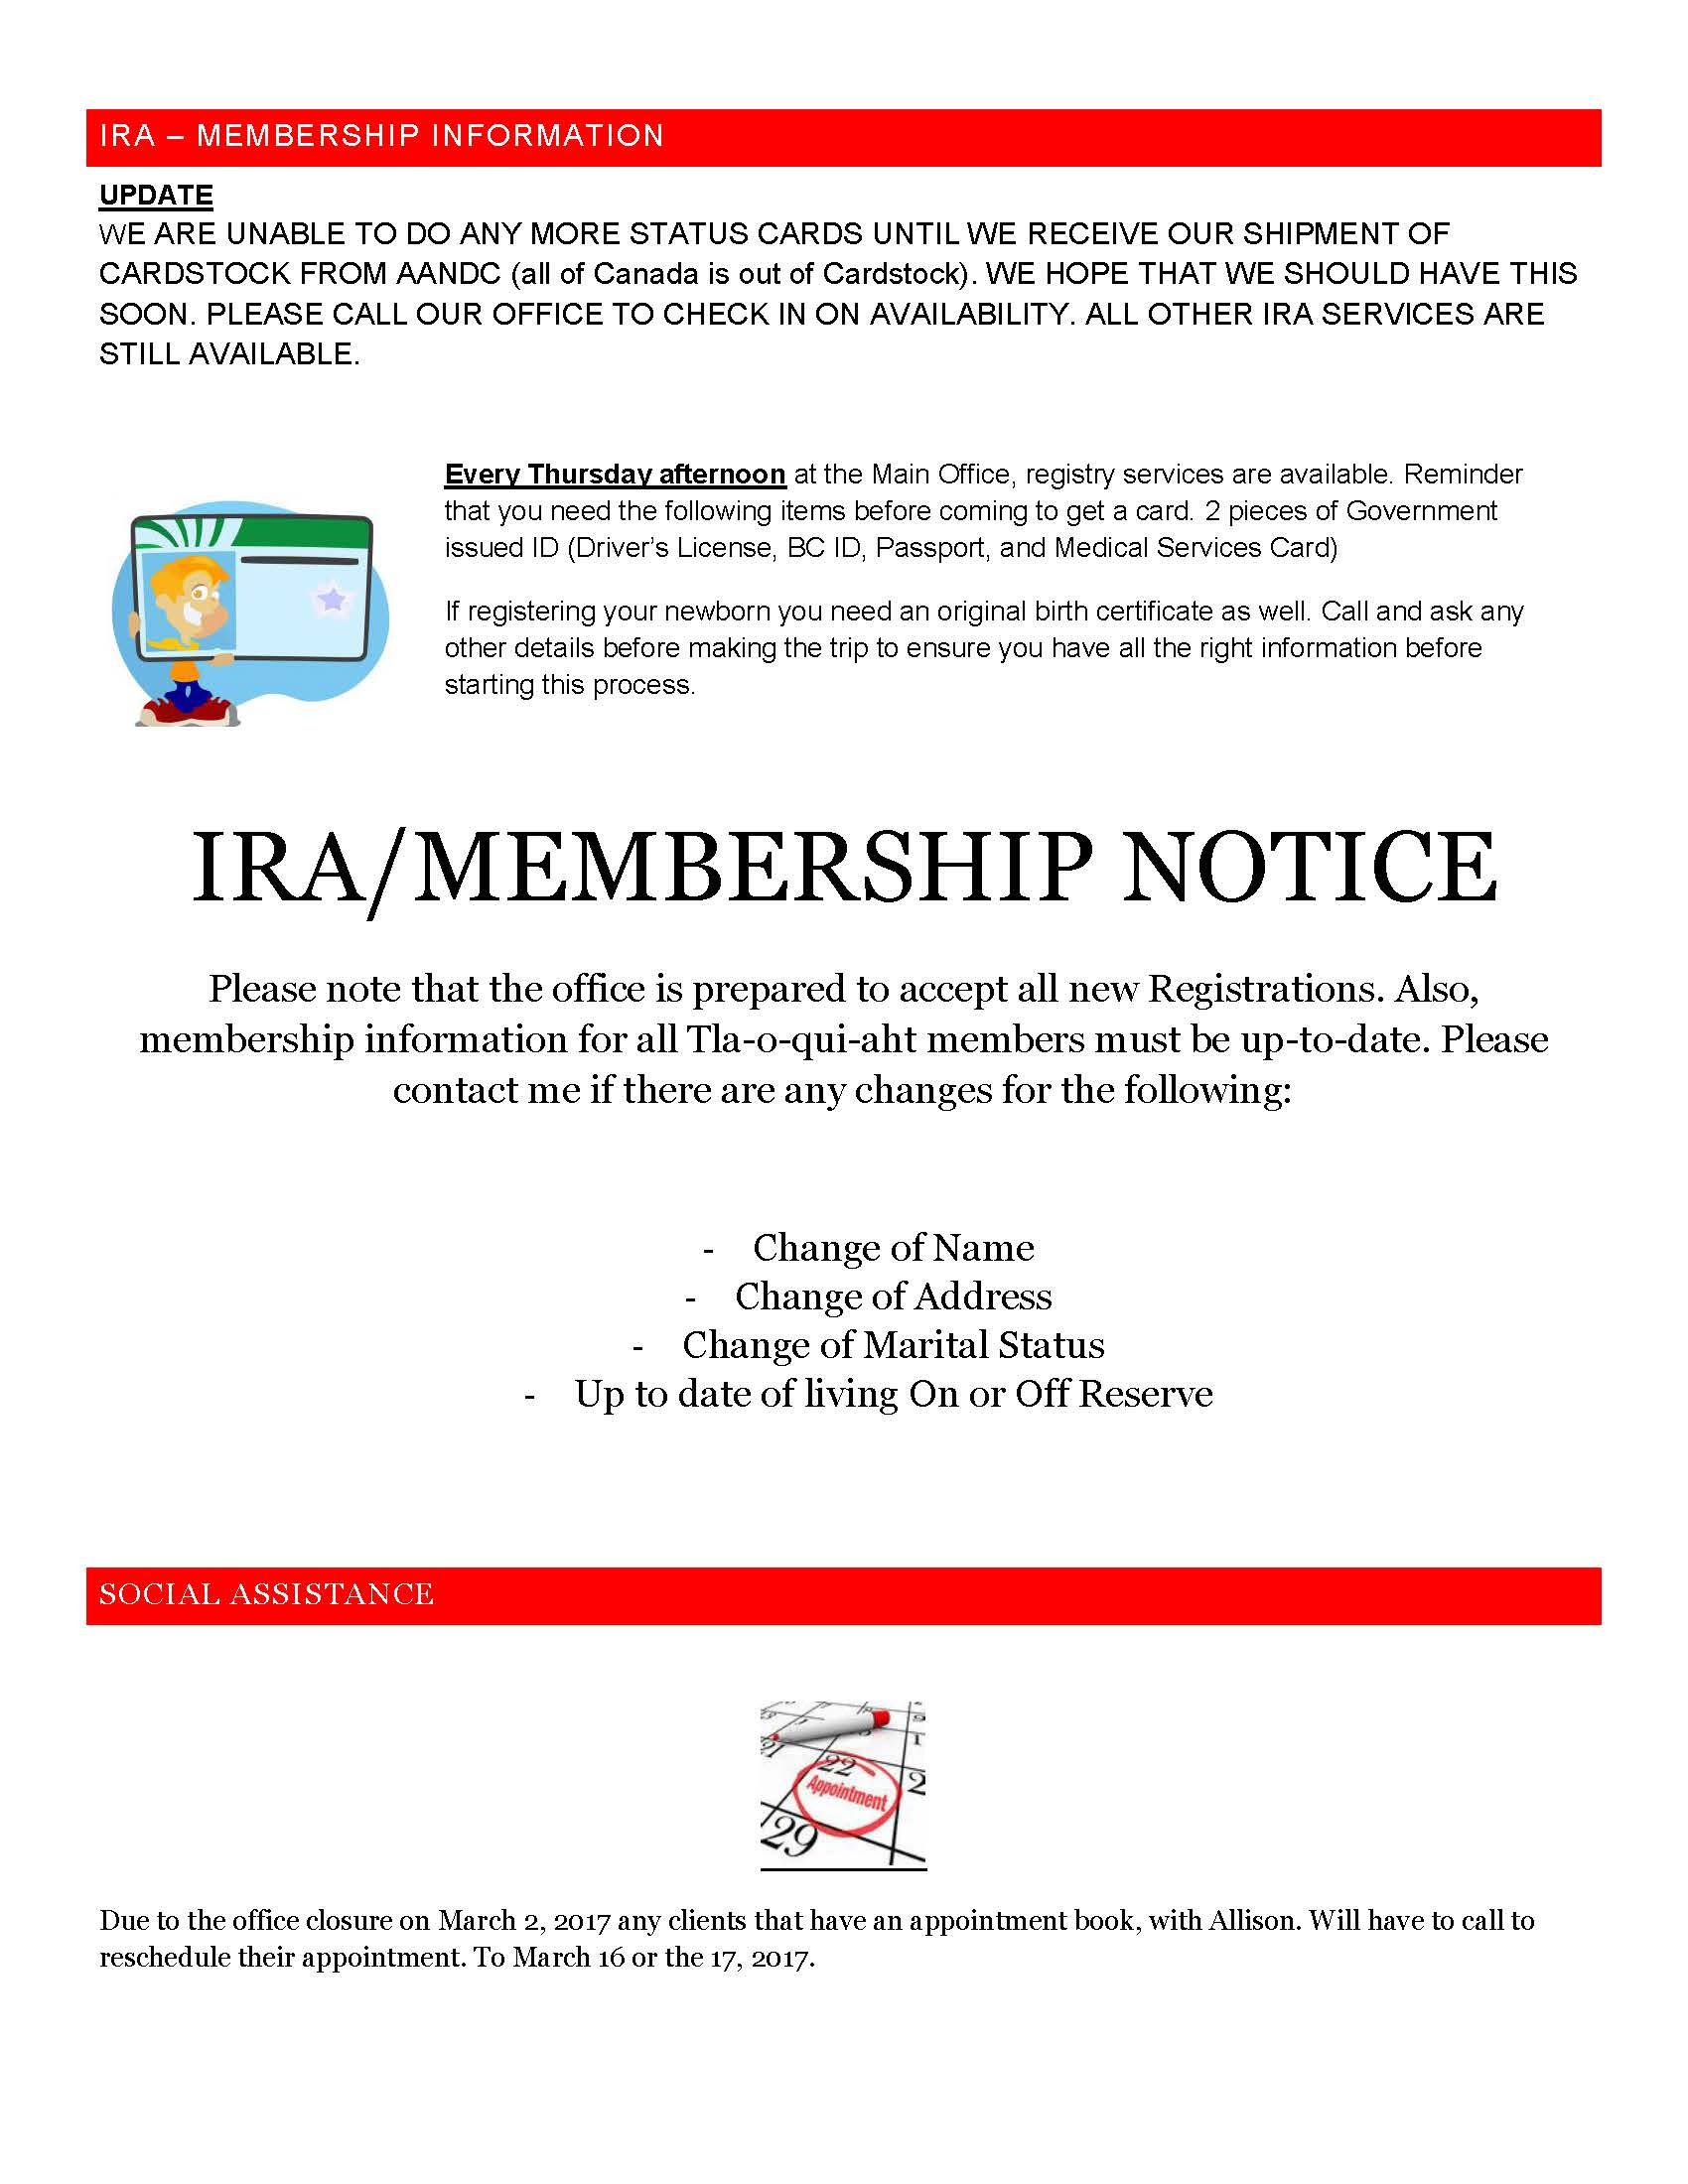 TFN Bulletin March 1 2017_Page_03.jpg